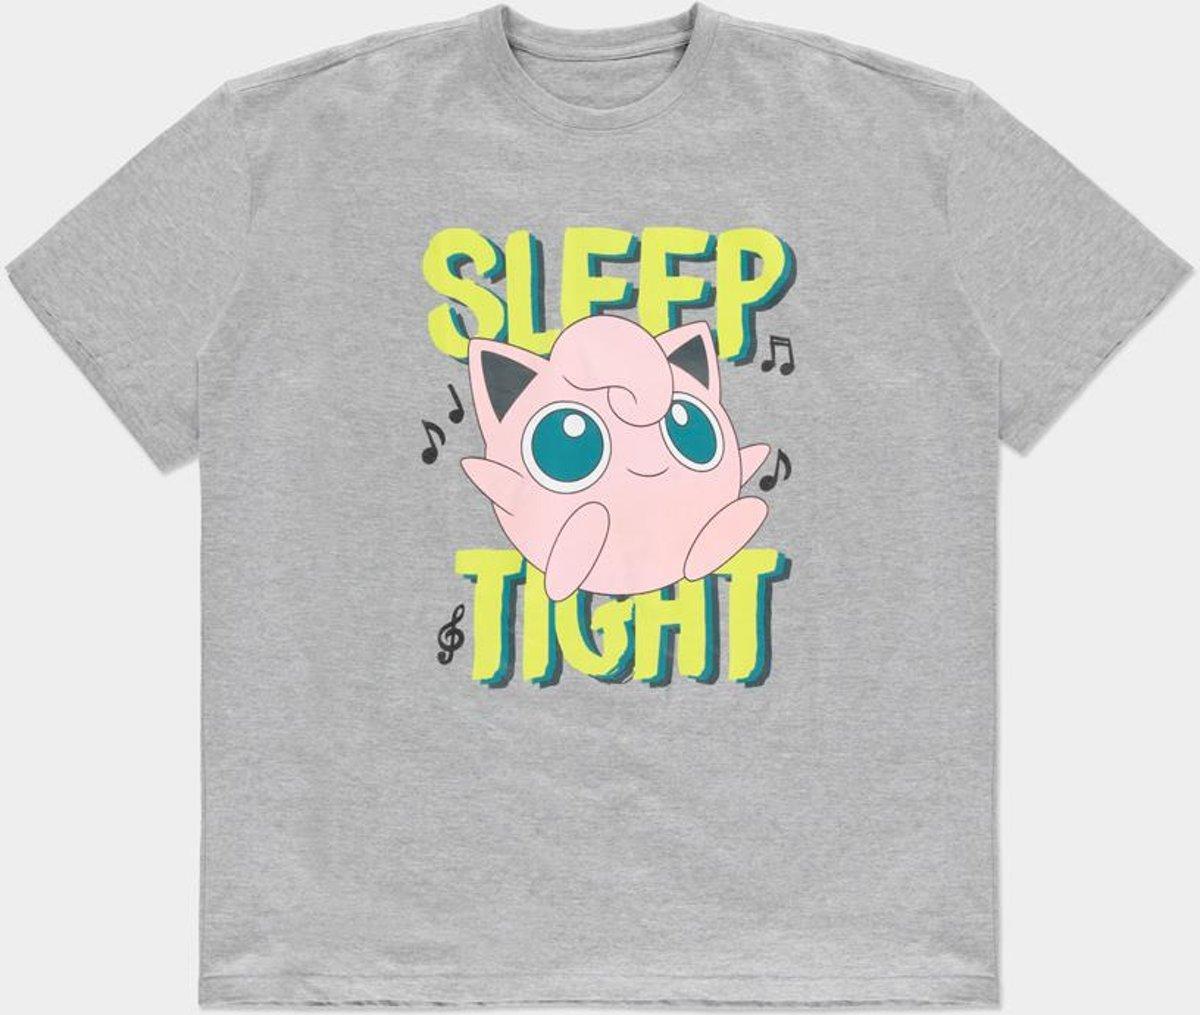 Pokémon - Jigglypuff Oversized Women's T-shirt - L kopen